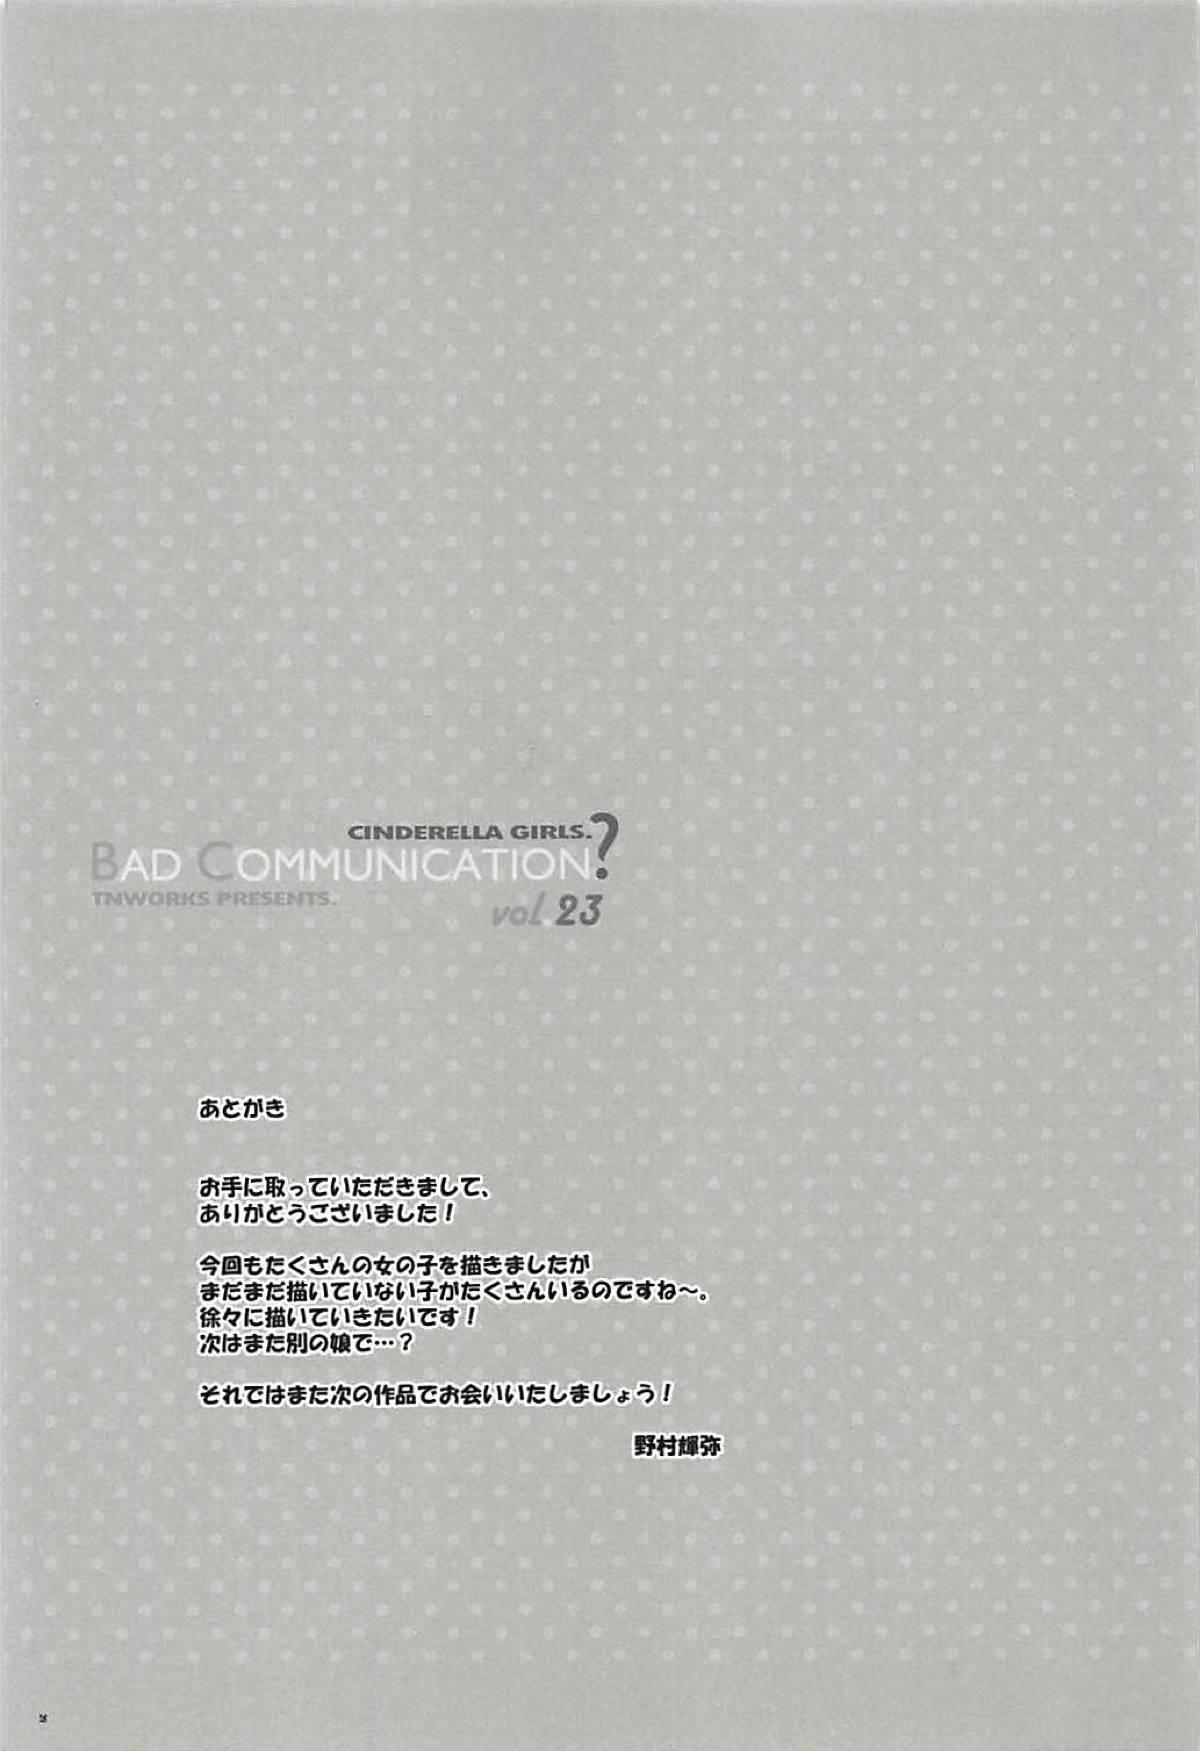 BAD COMMUNICATION? vol. 23 24